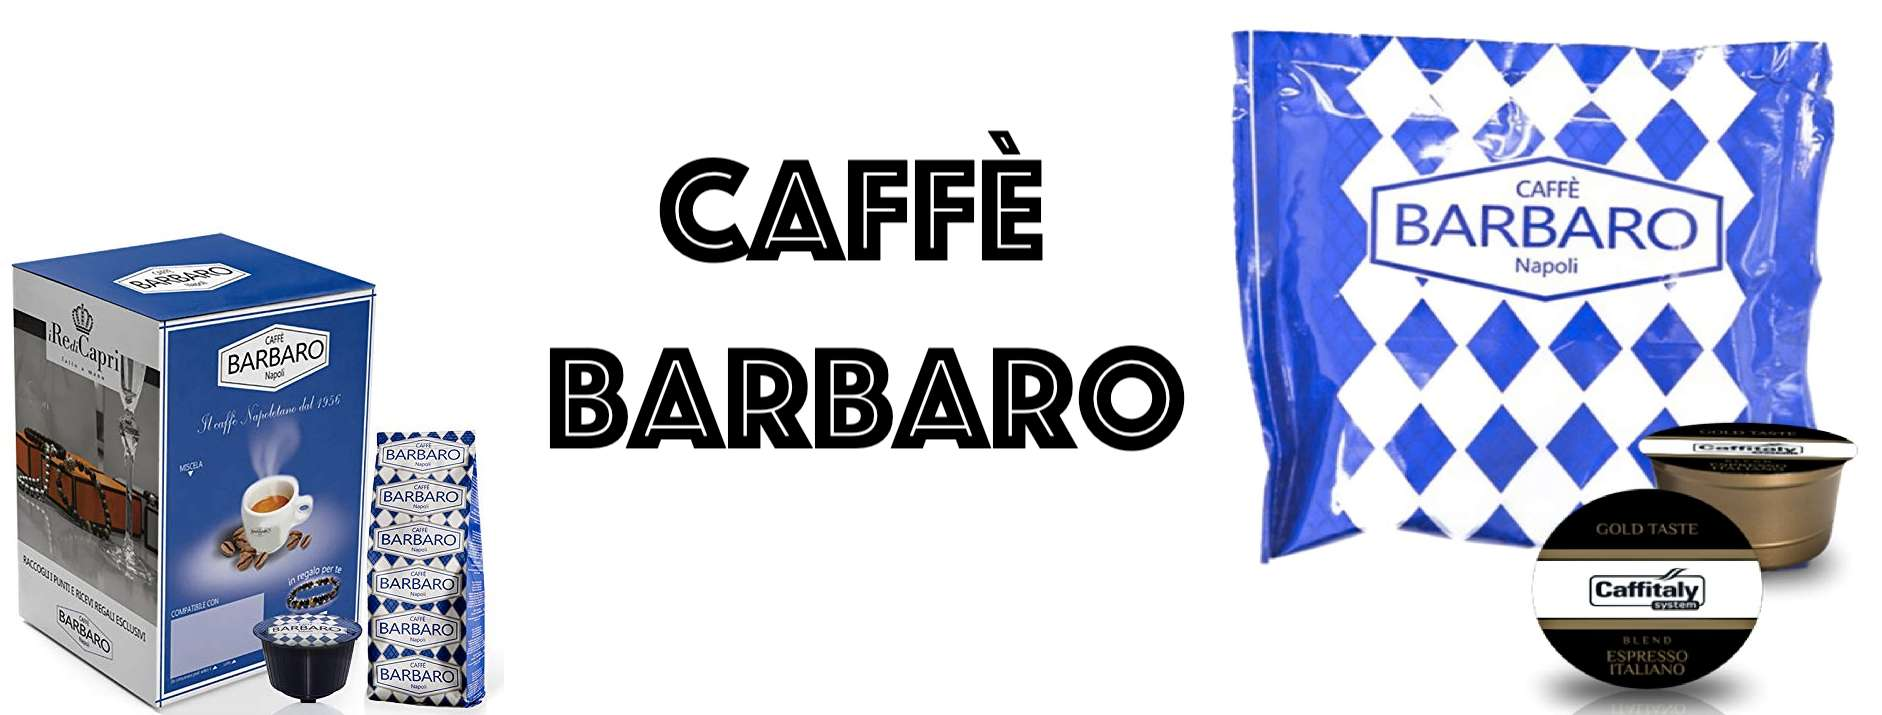 Caffe Barbaro cialda capsula